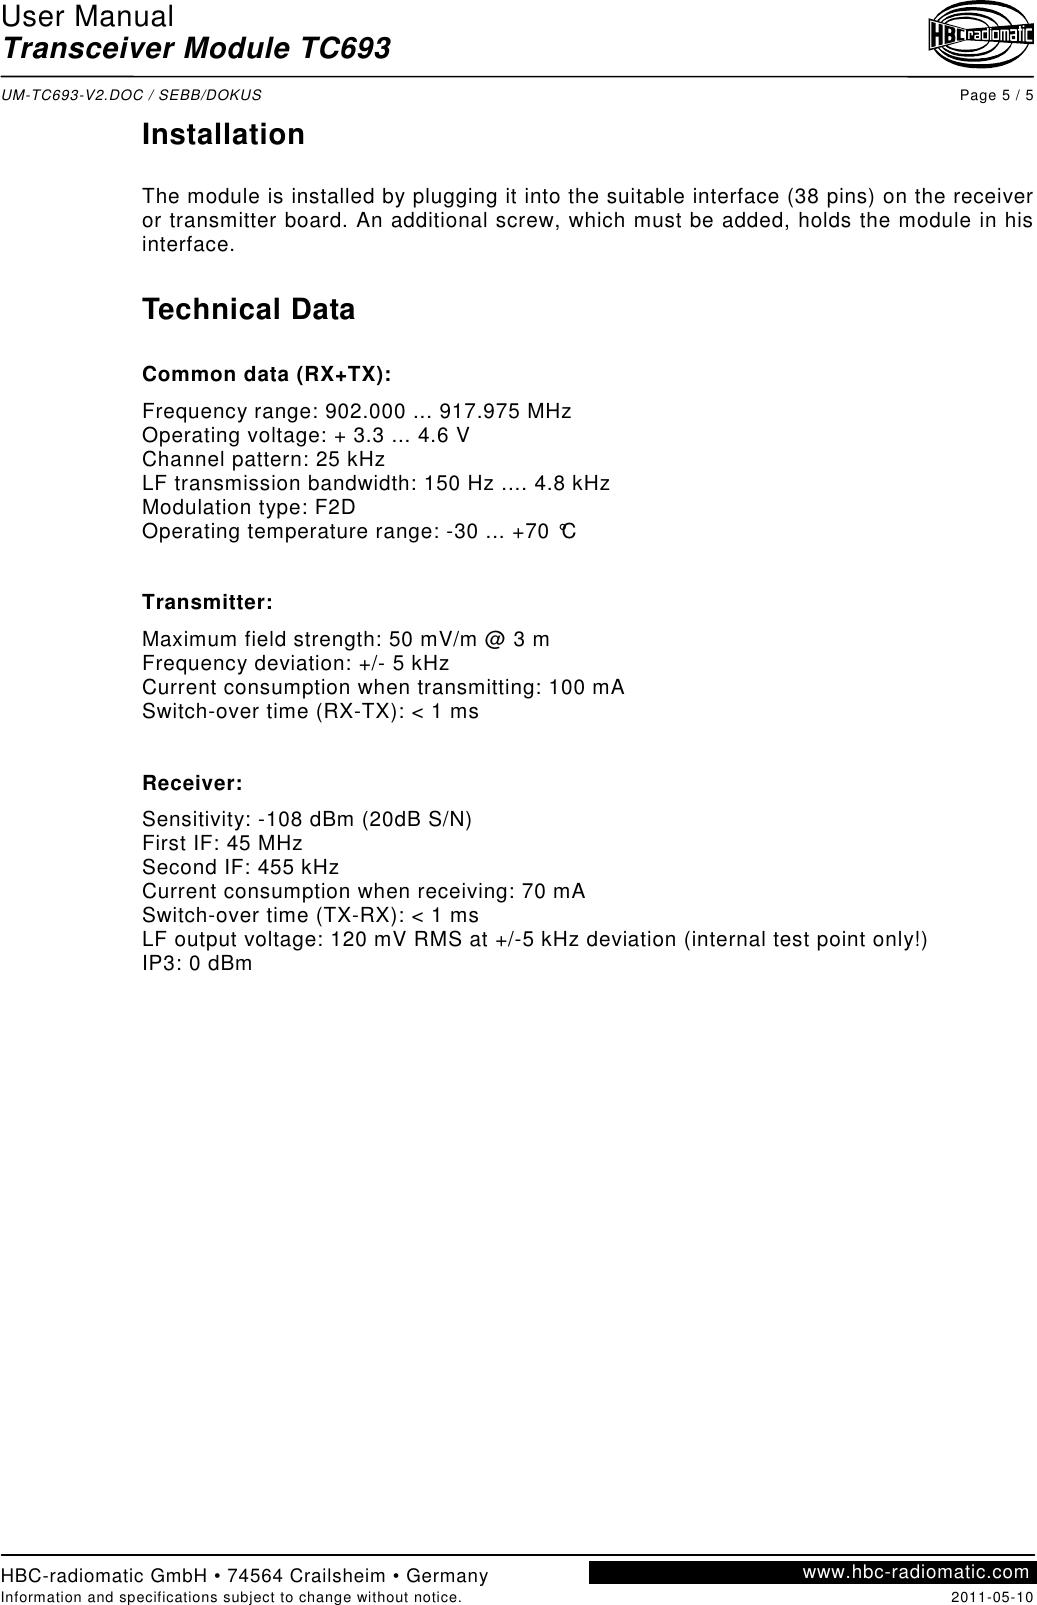 HBC radiomatic TC693 UHF transceiver for data transfer User Manual